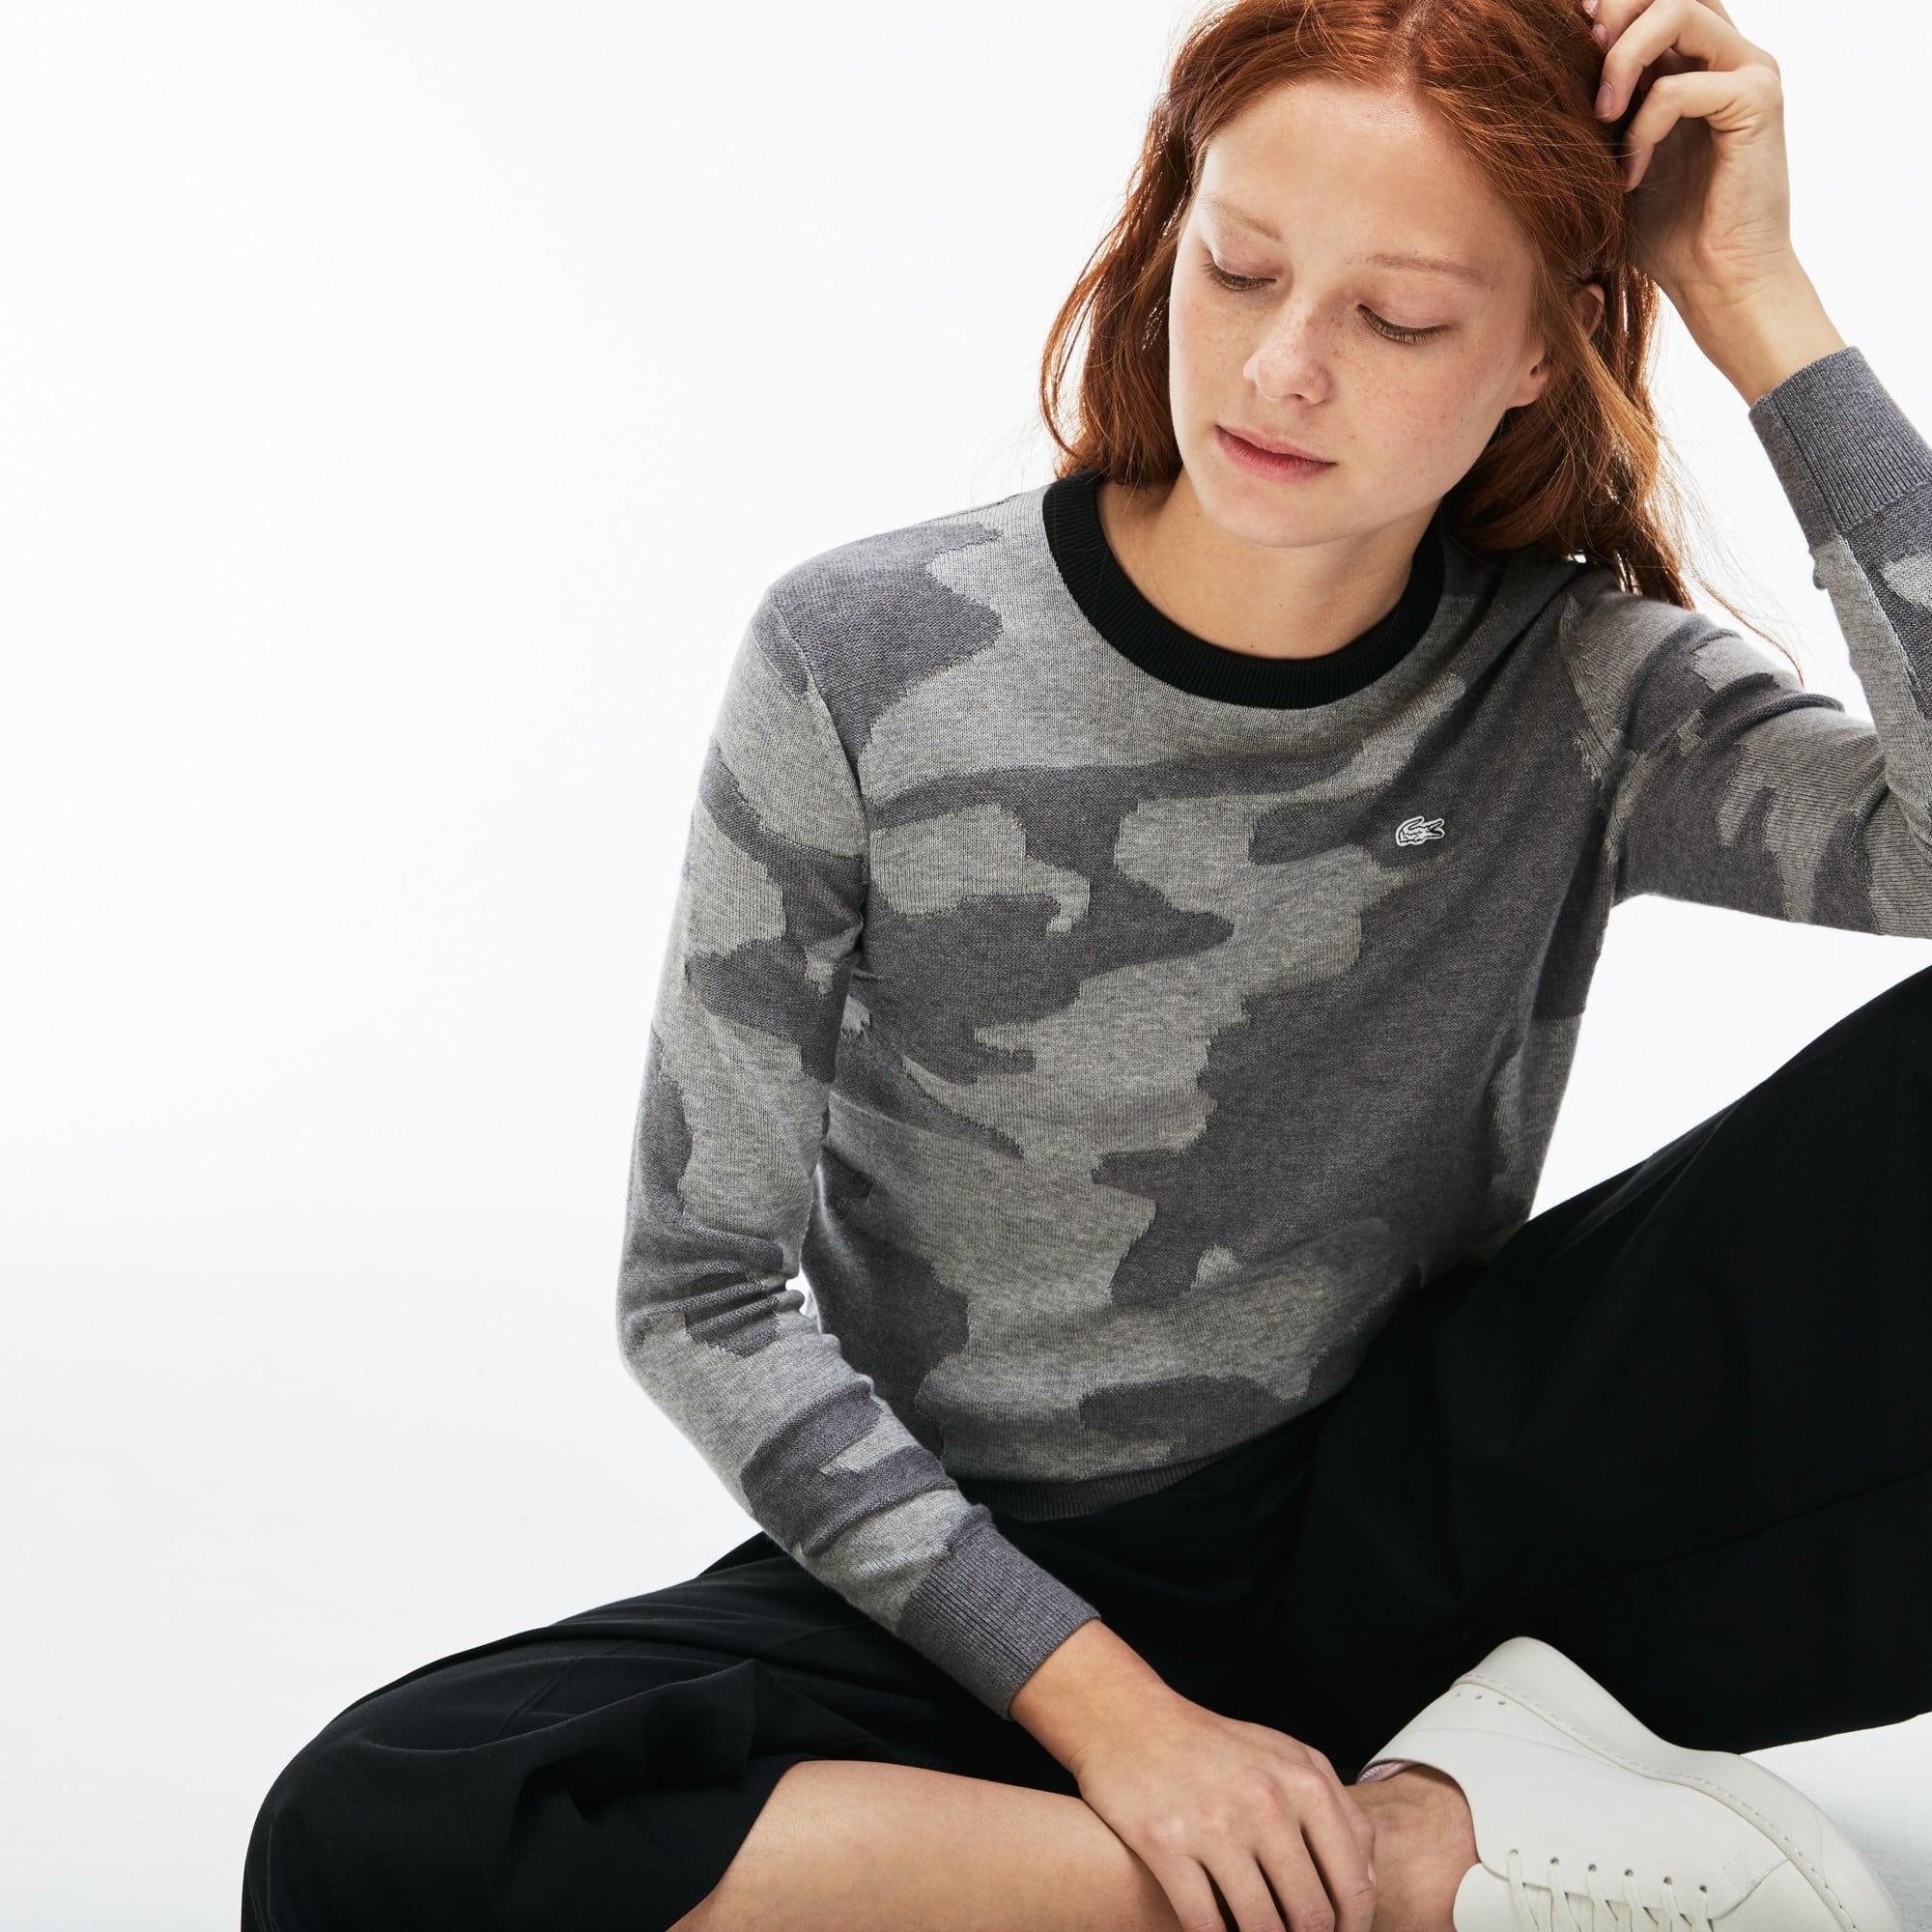 Lacoste LIVE-T-sweater dames ronde hals camouflageprint jacquard